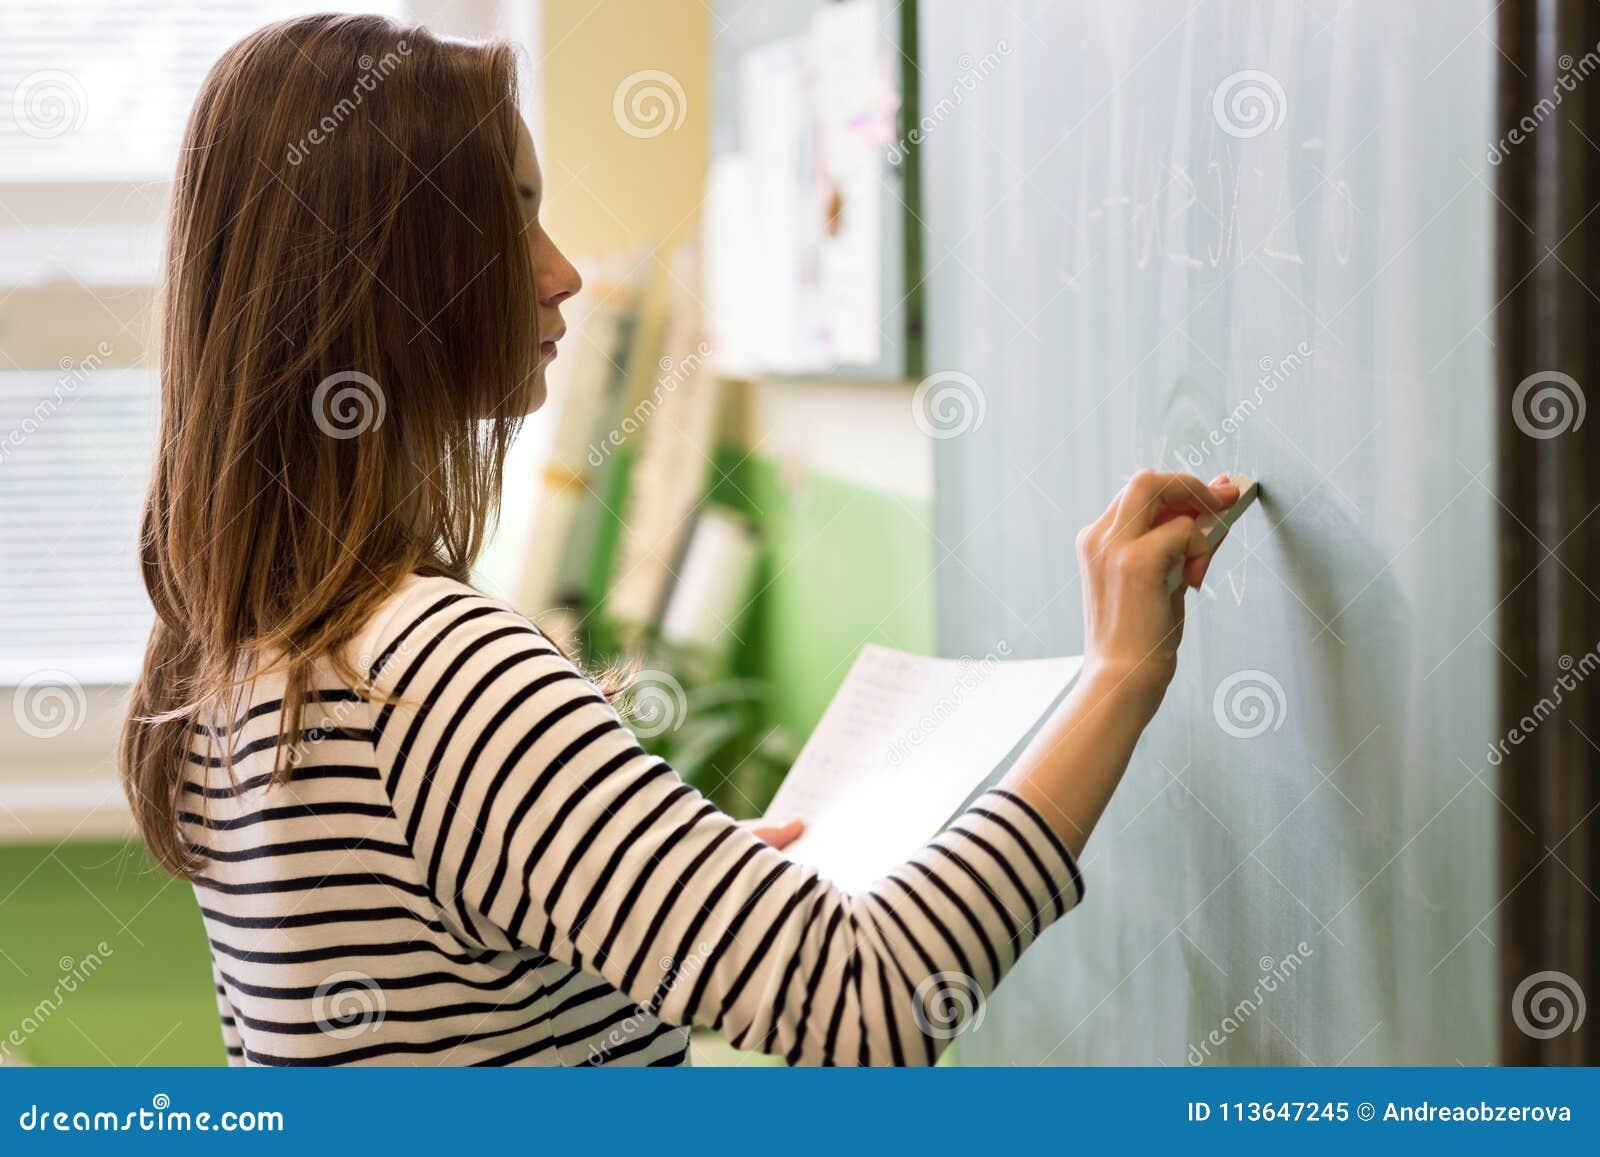 Young female teacher or a student writing math formula on blackboard.